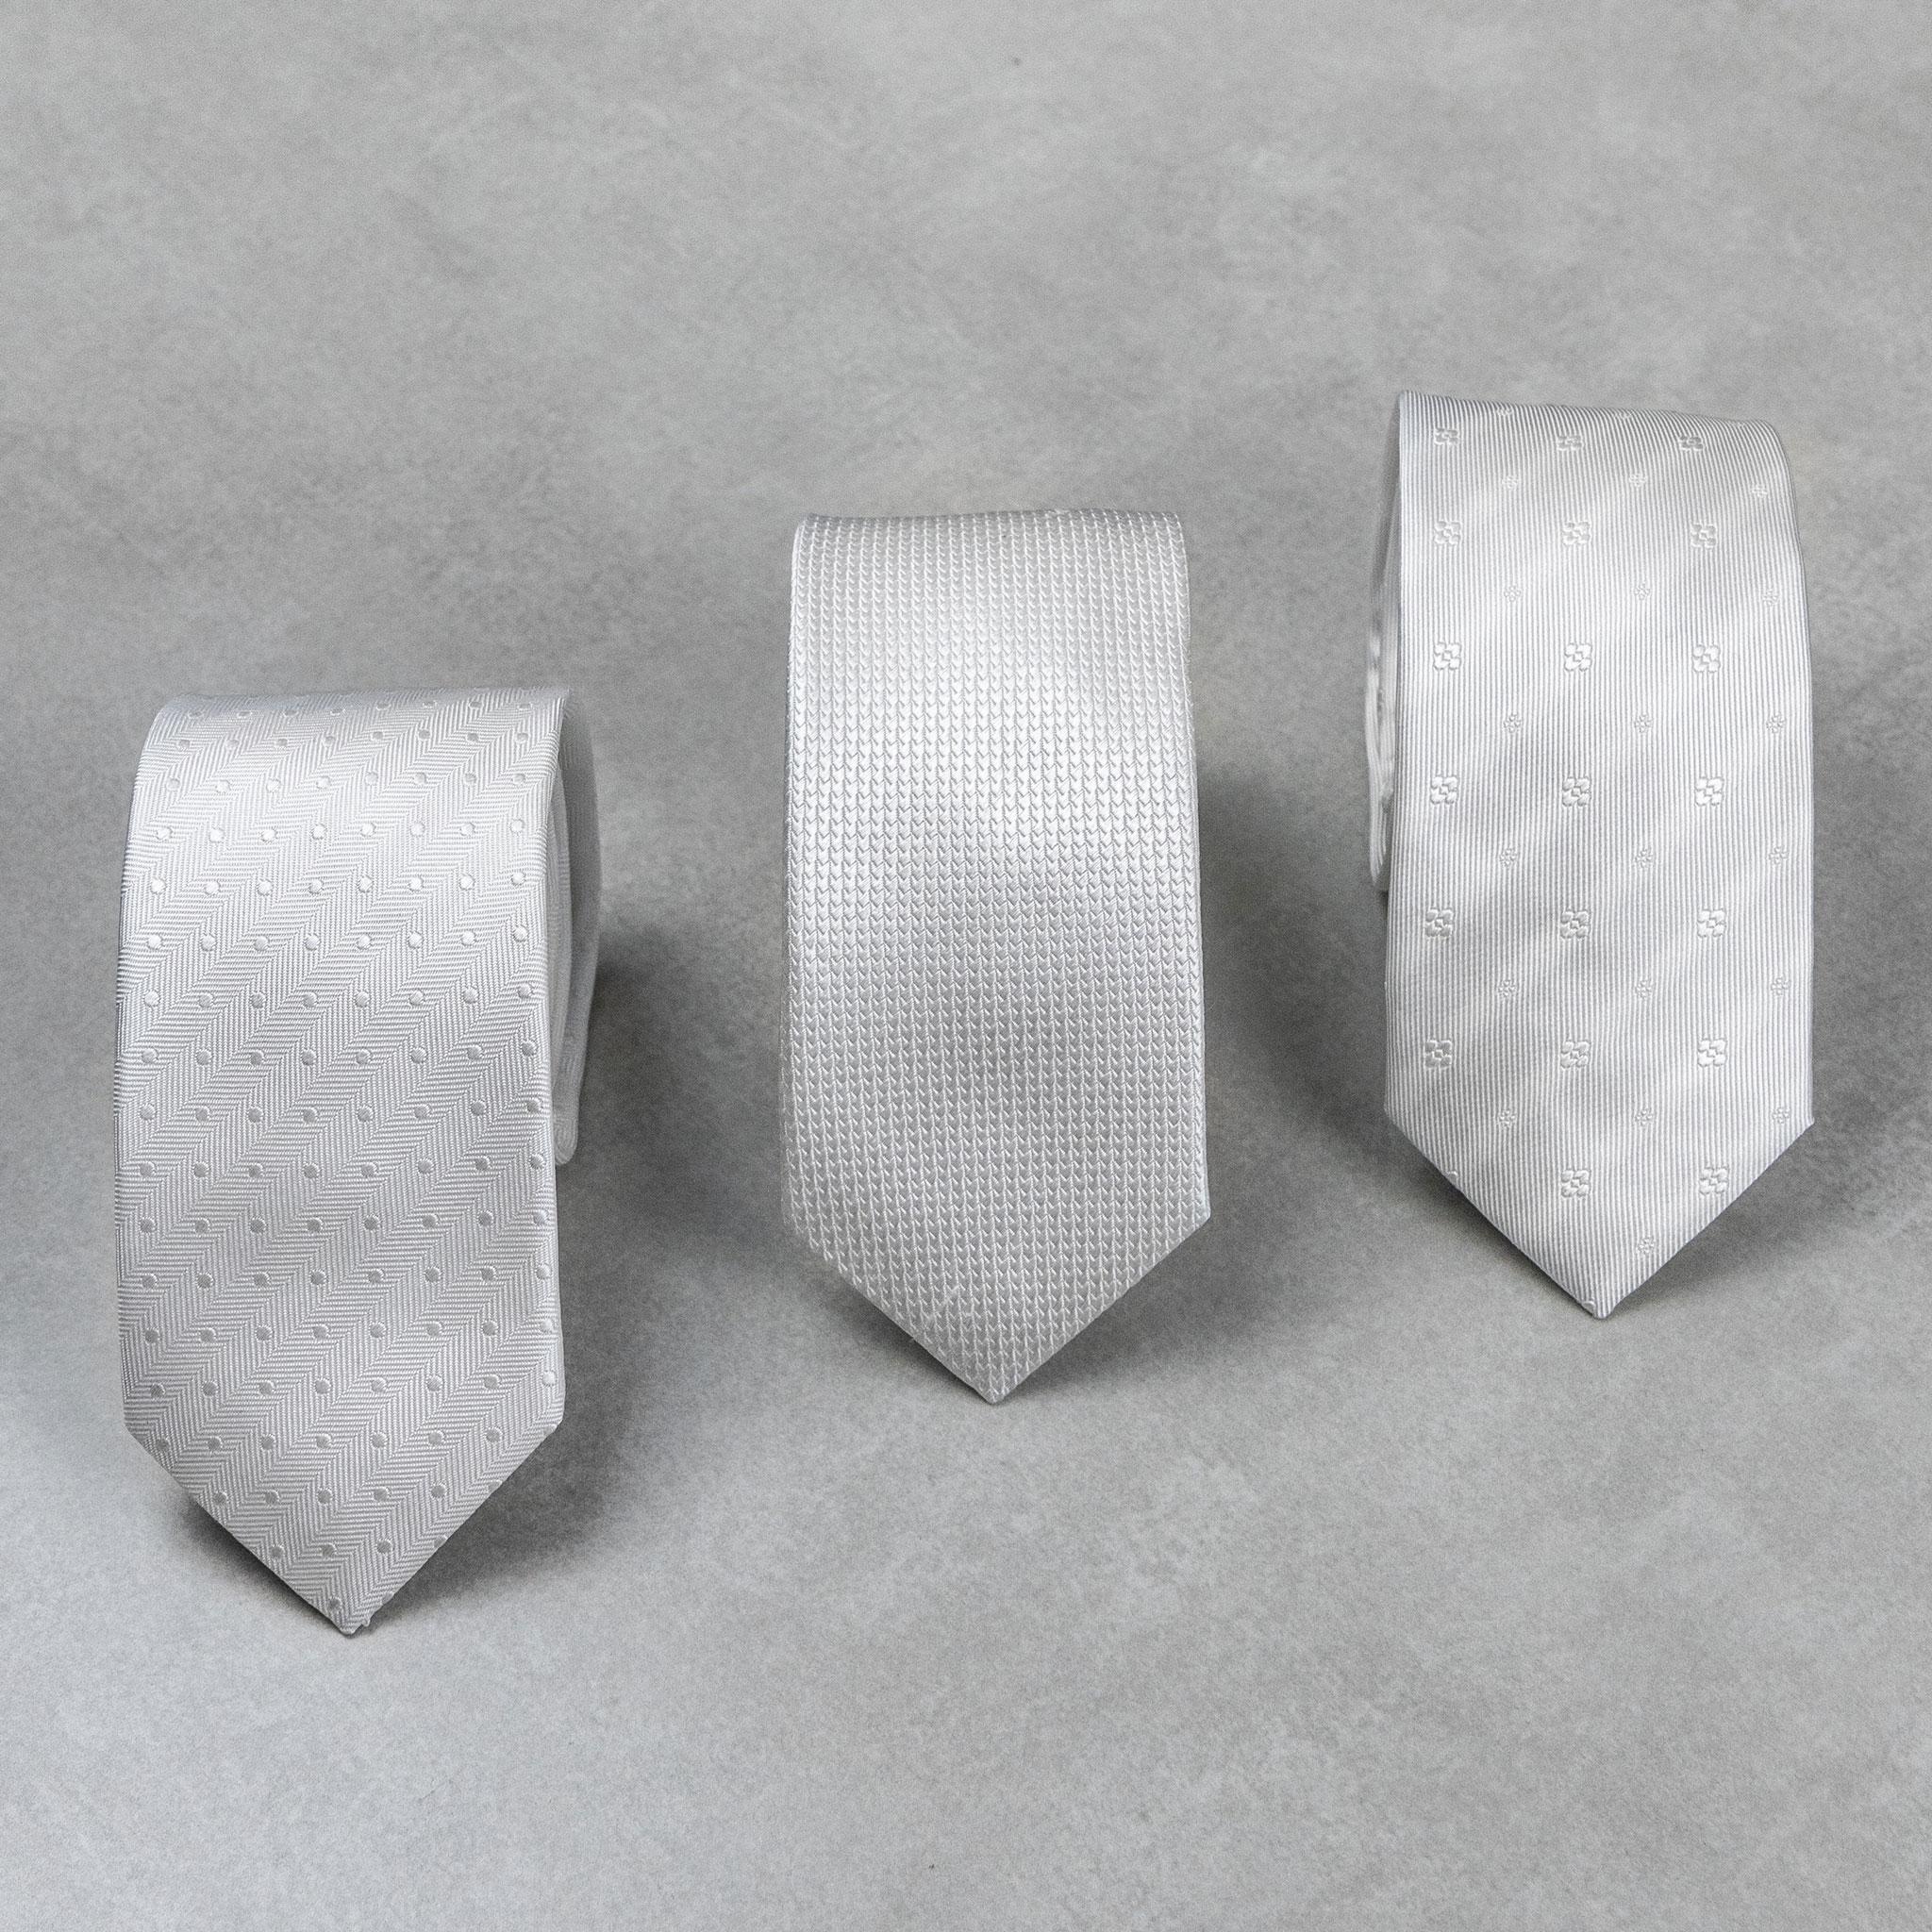 gravata off-white de seda para casamento